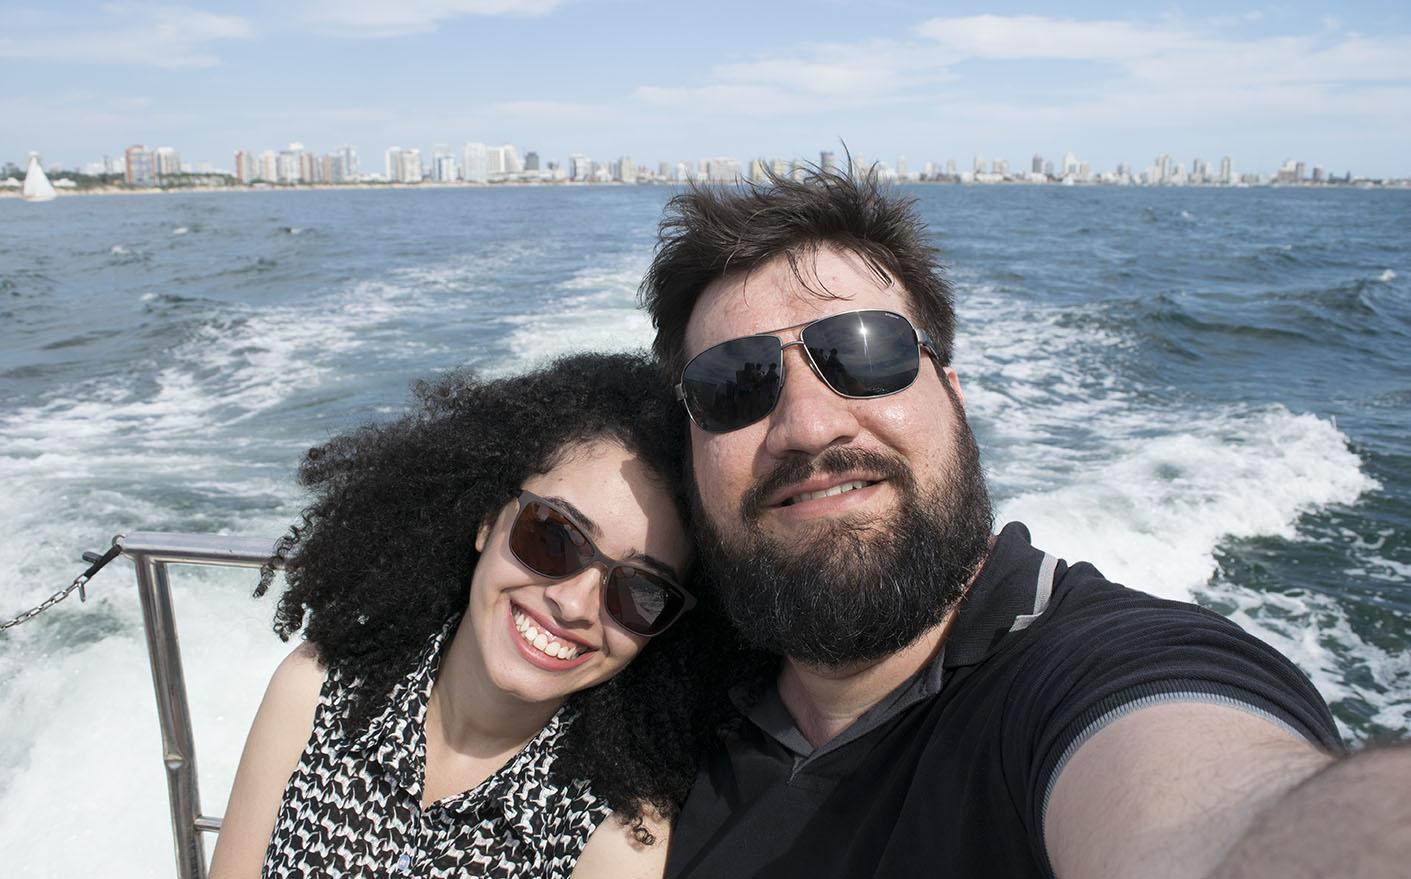 Cruzeiro Lua de Mel - Passeio de Lancha no Uruguai